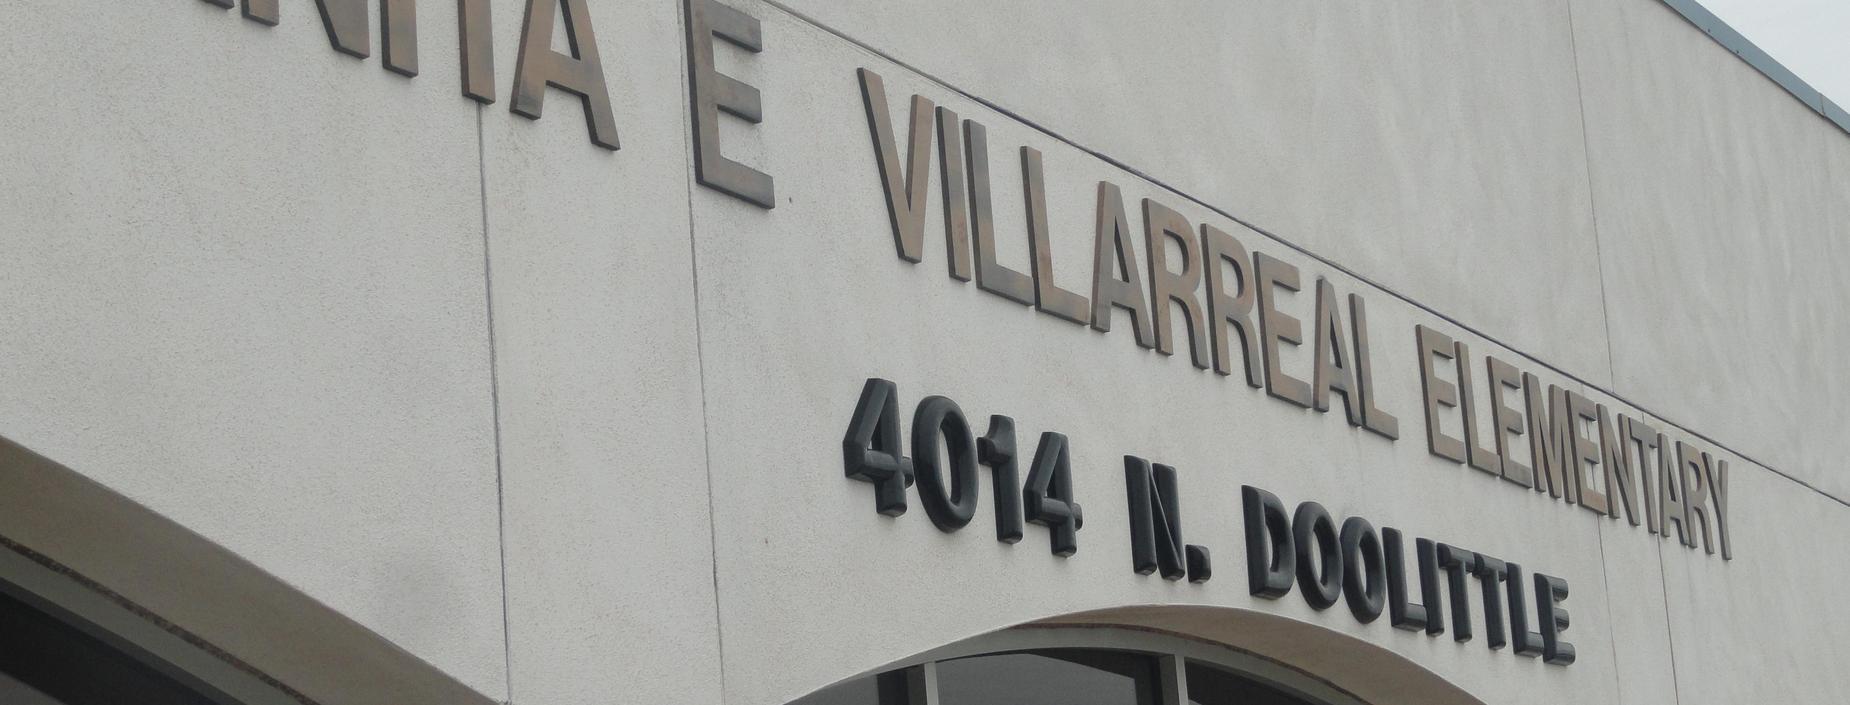 school name on front of school building